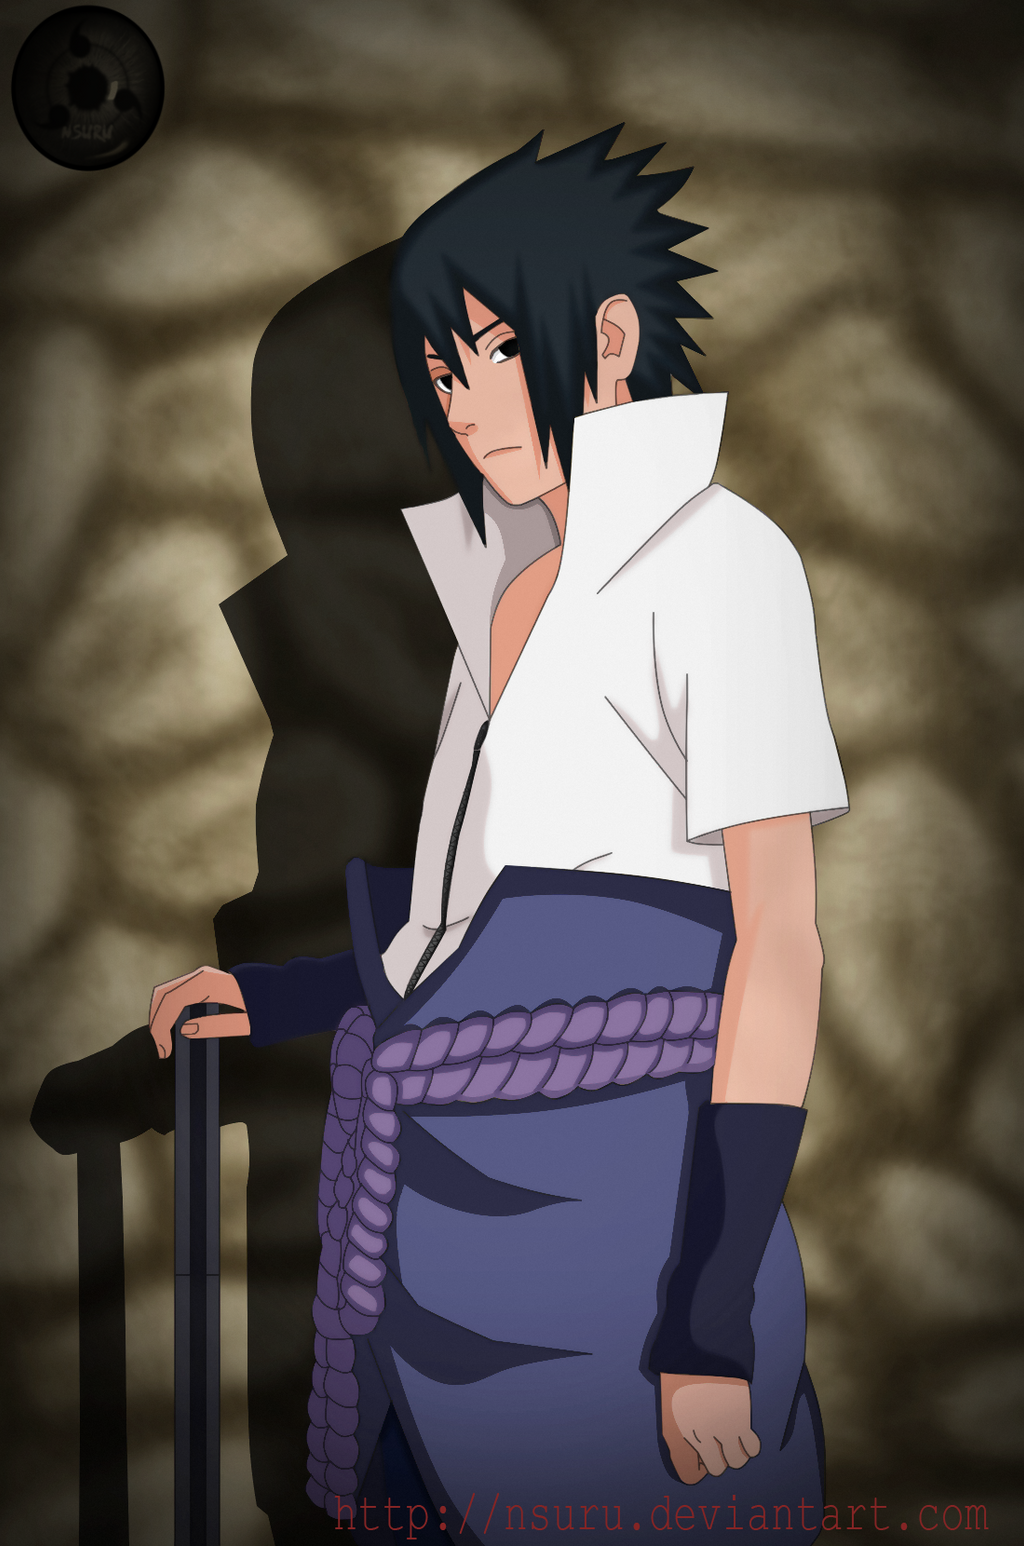 Sasuke tomo del manga numero 408 by NSURU on DeviantArt